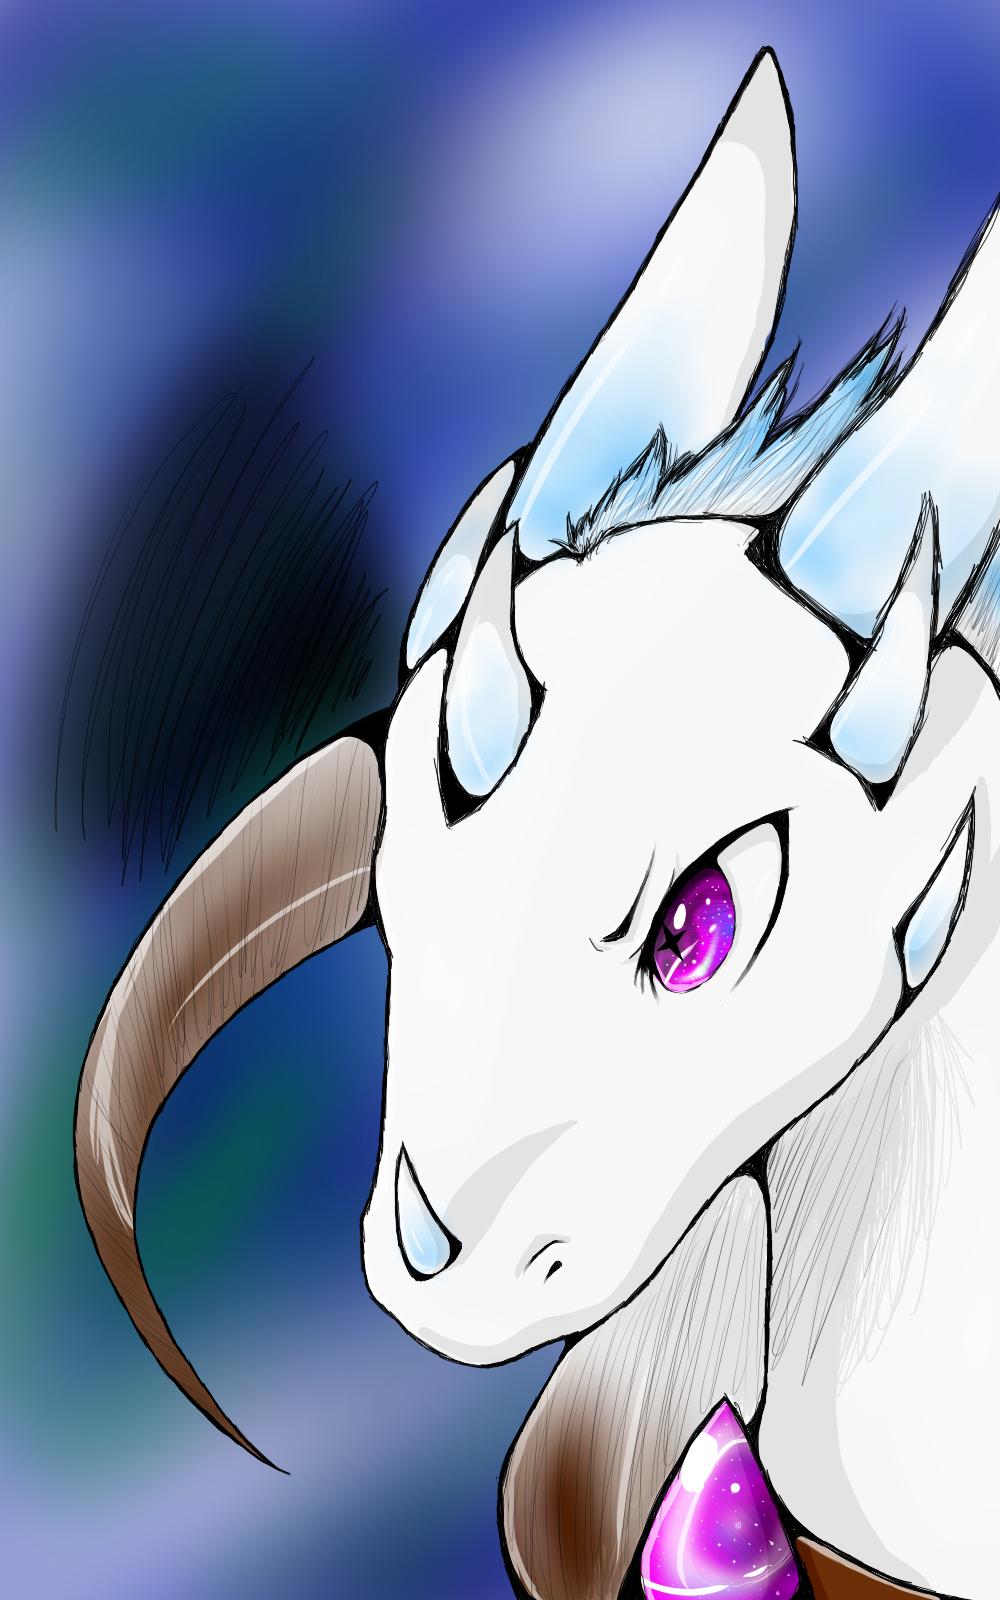 Dragon by Dakalebii